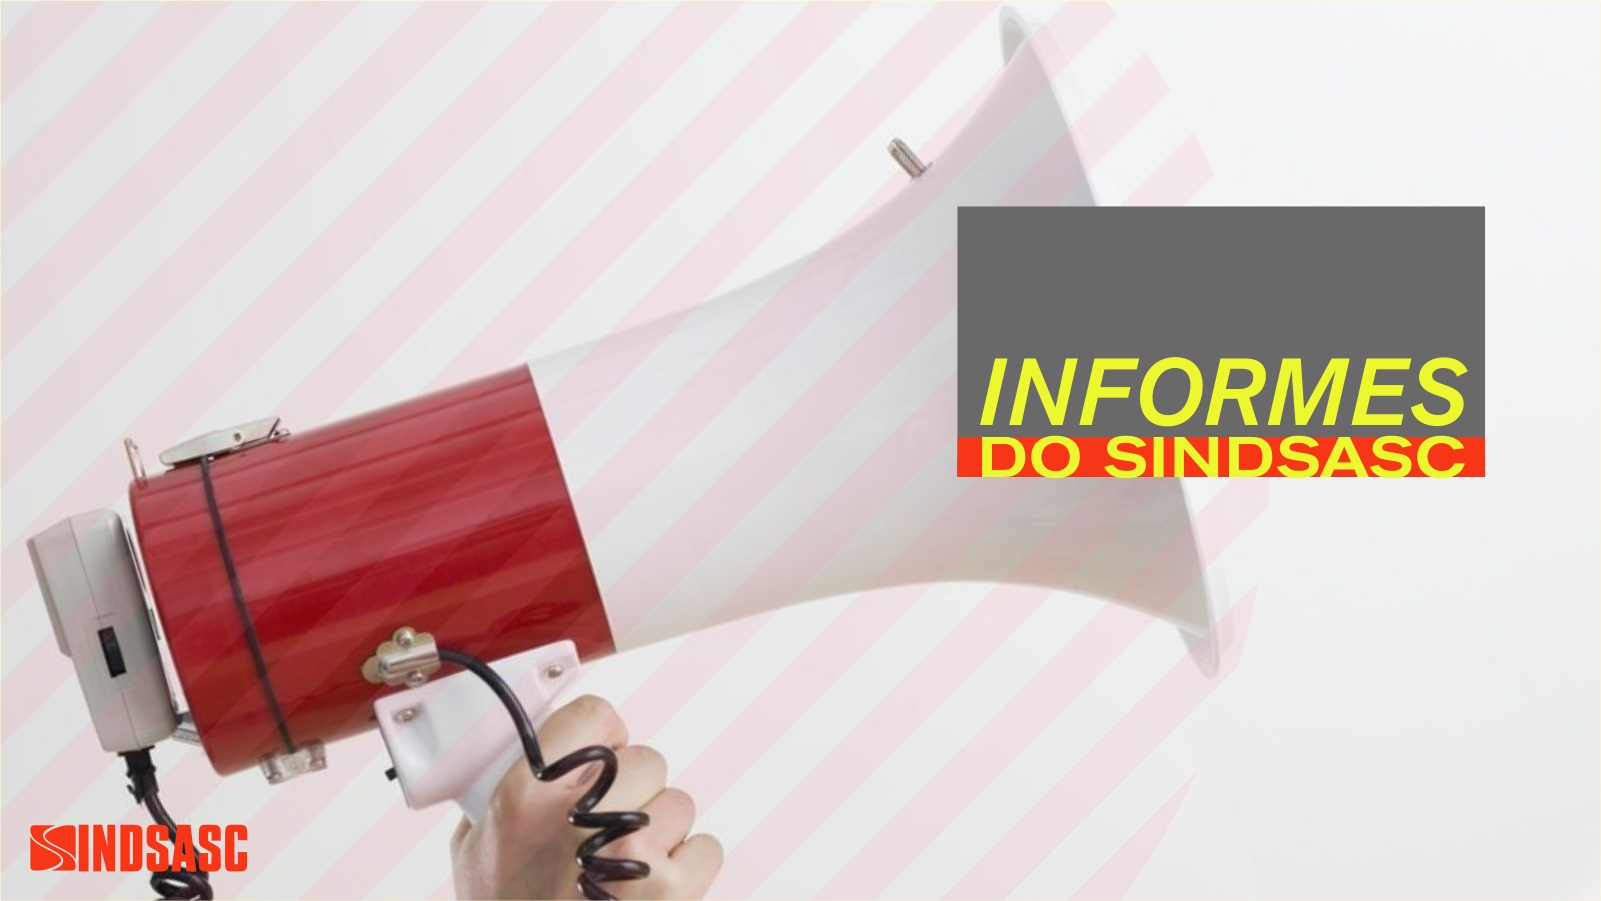 INFORMES DO SINDSASC Quinta-feira, 09 de abril